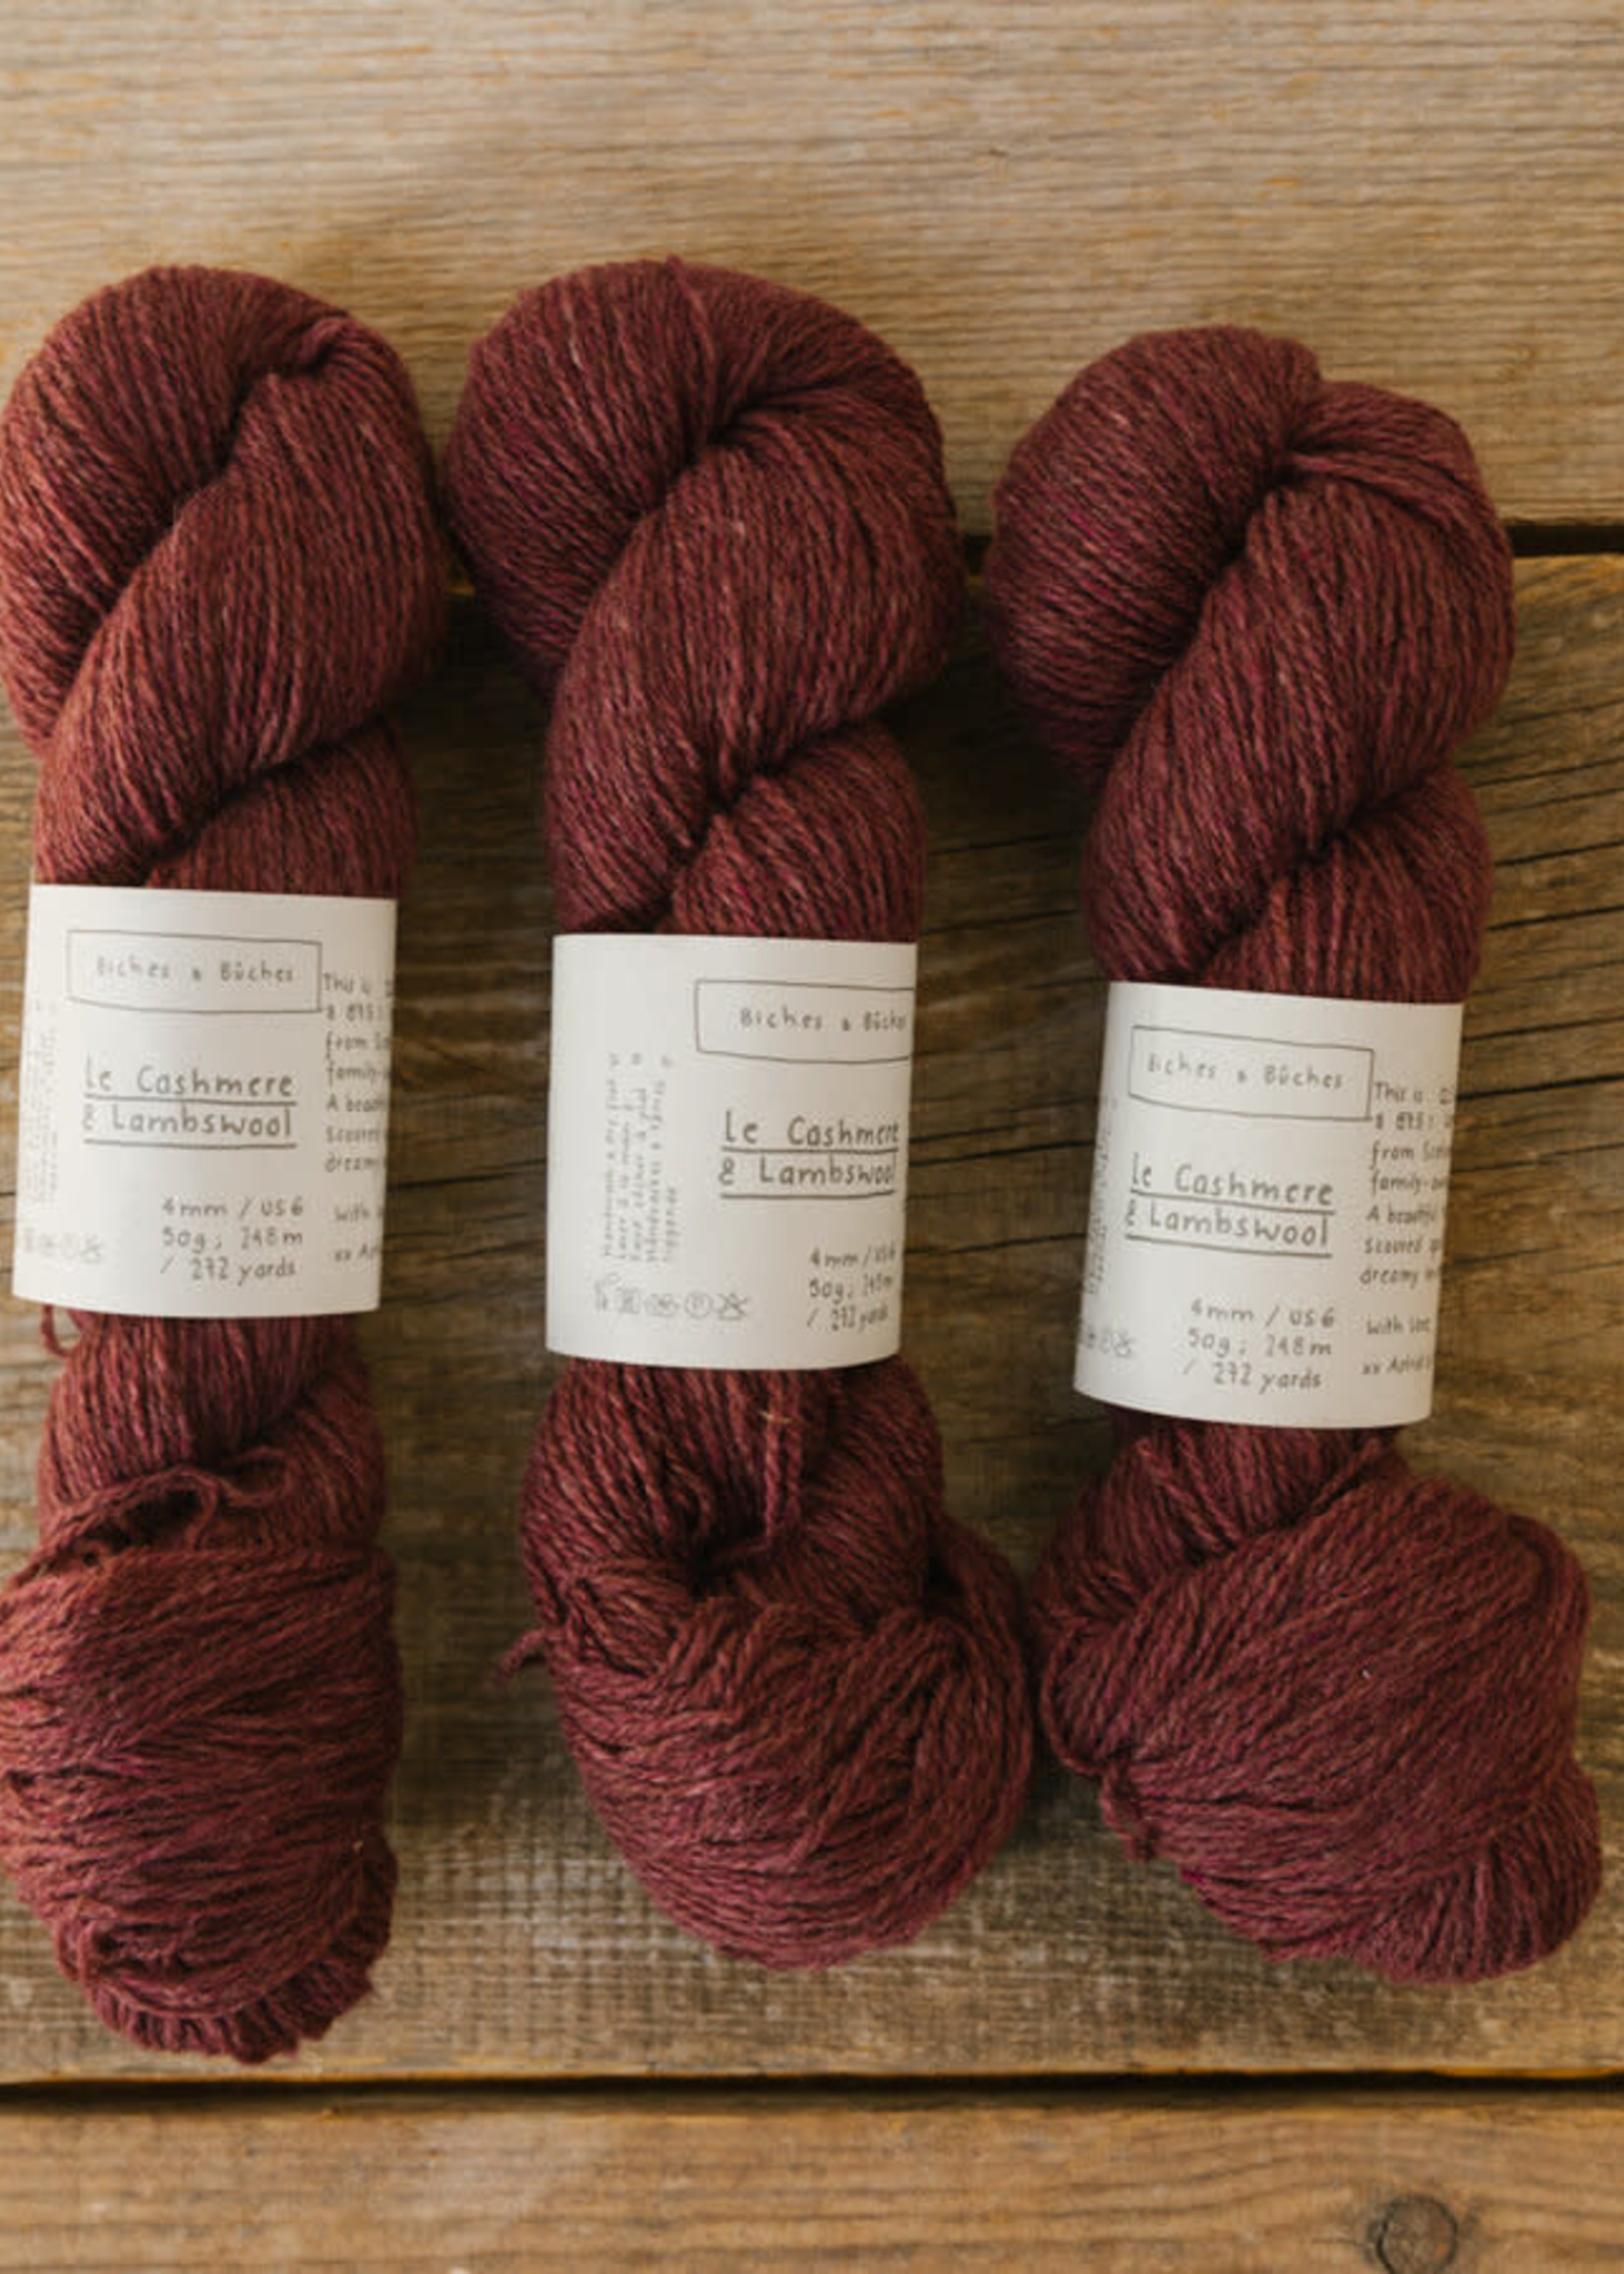 Biches & Bûches Biches & Buches Le Cashmere & Lambswool Soft Medium Burgundy